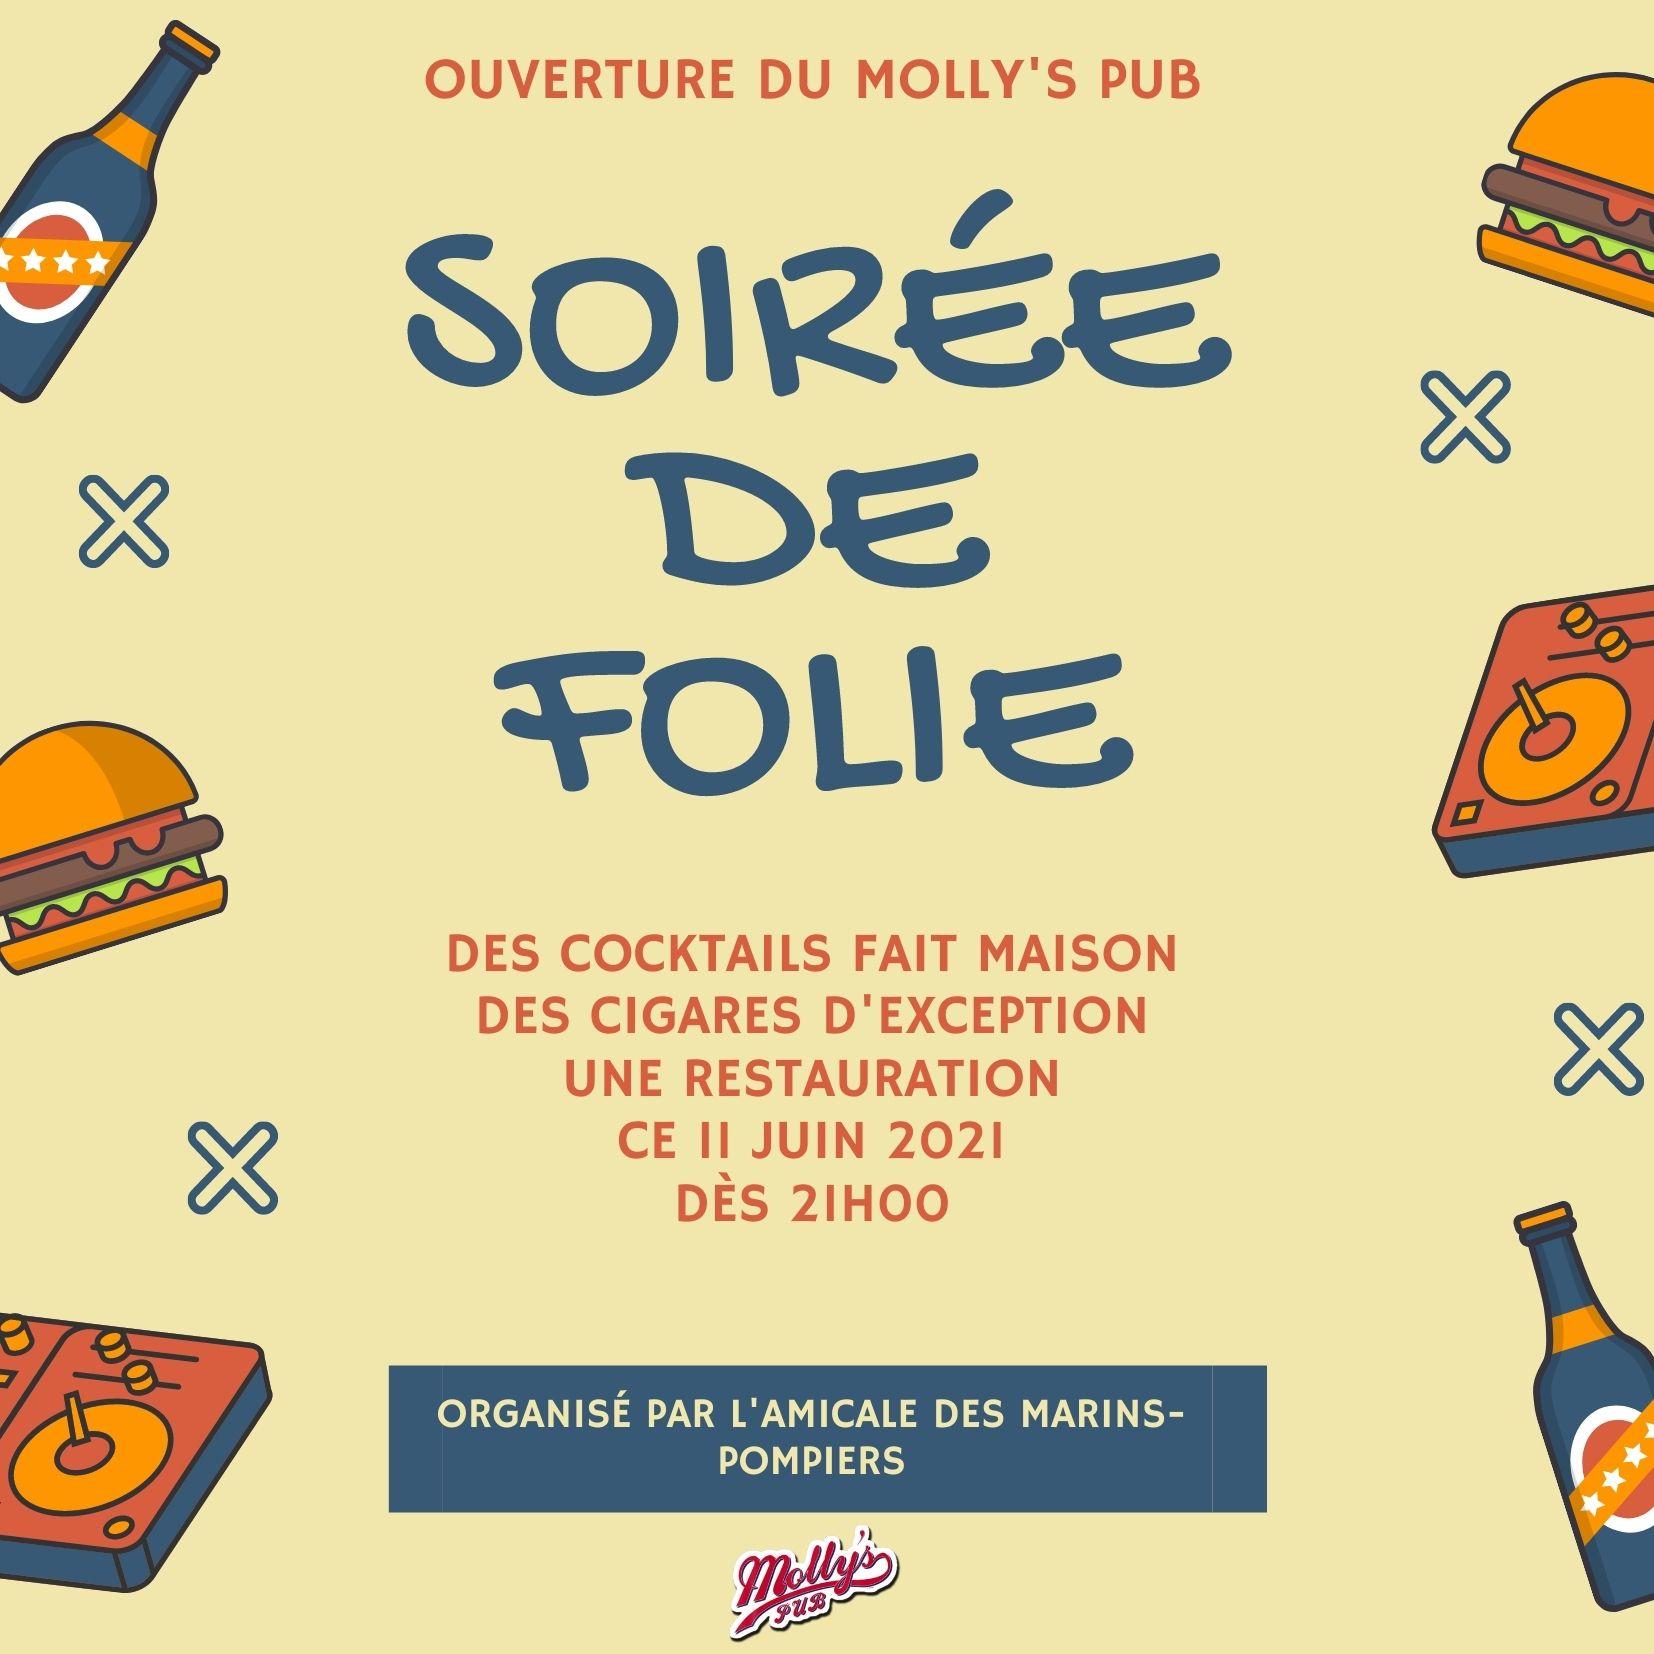 Molly's Pub Ouverture.jpg